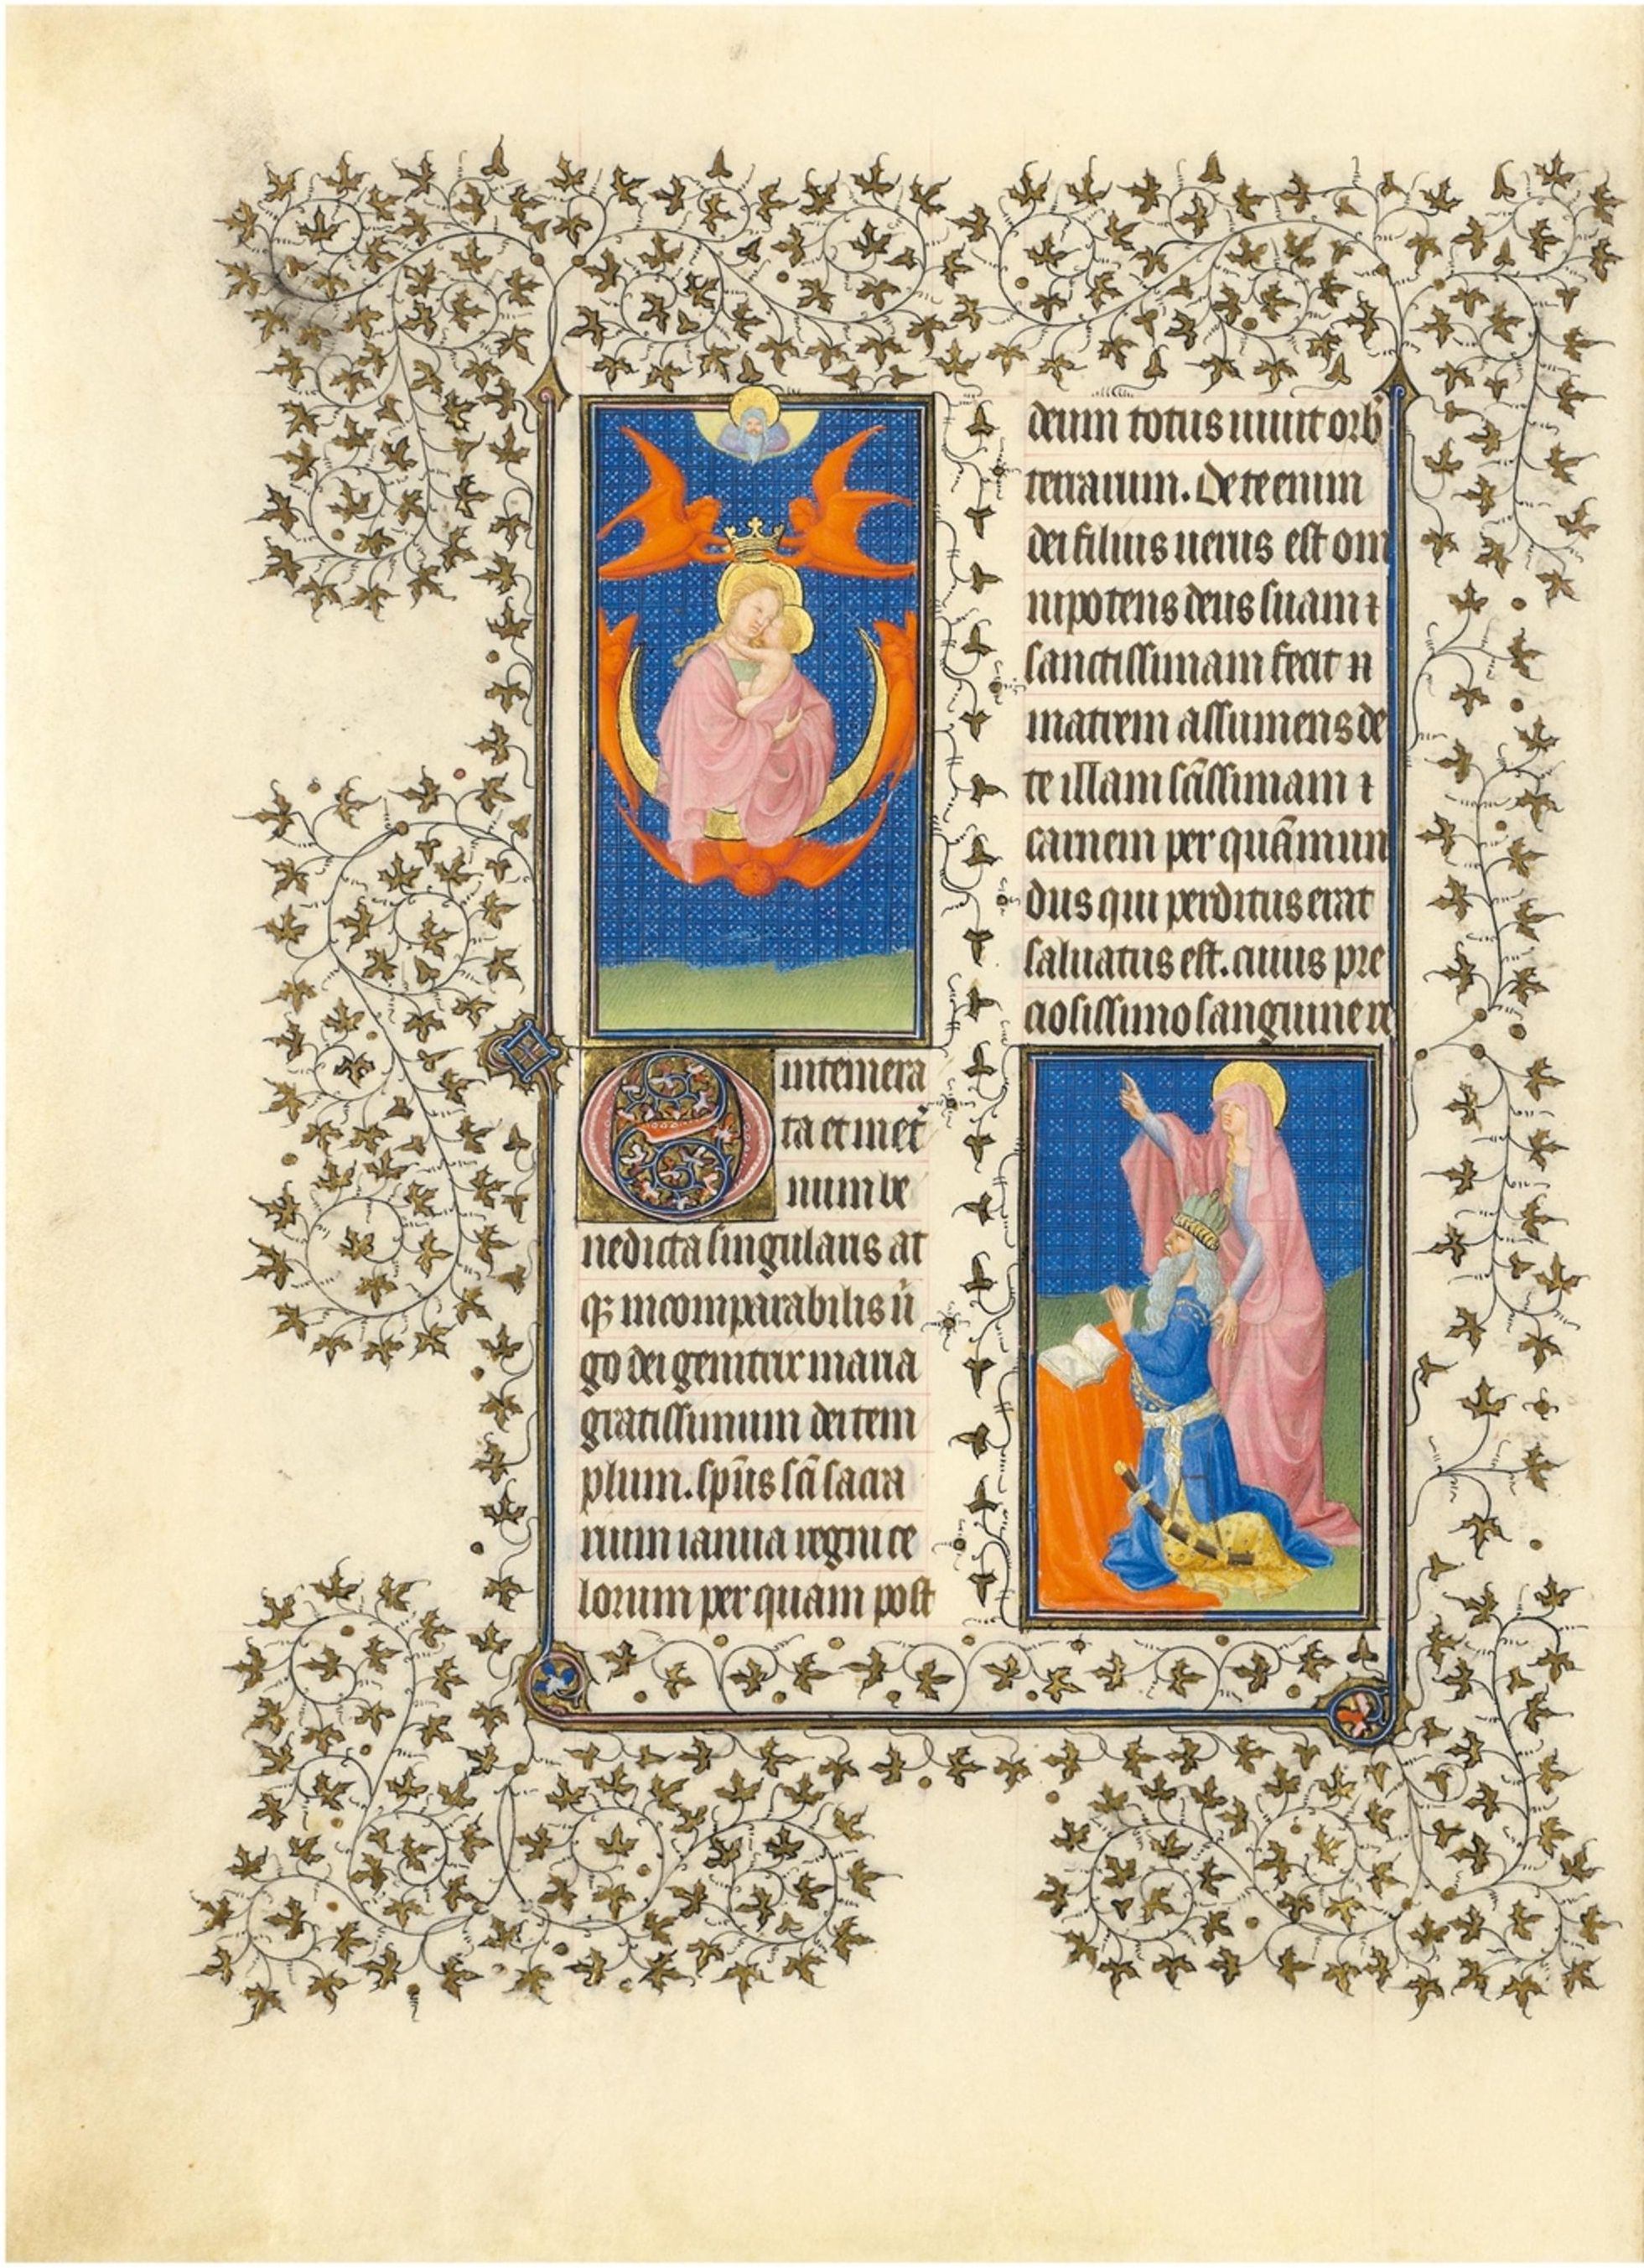 1405-09 Belles Heures du duc de Berry - f26v - La Vierge Aracoeli, l'empereur Auguste et la sibylle de Tibur MET